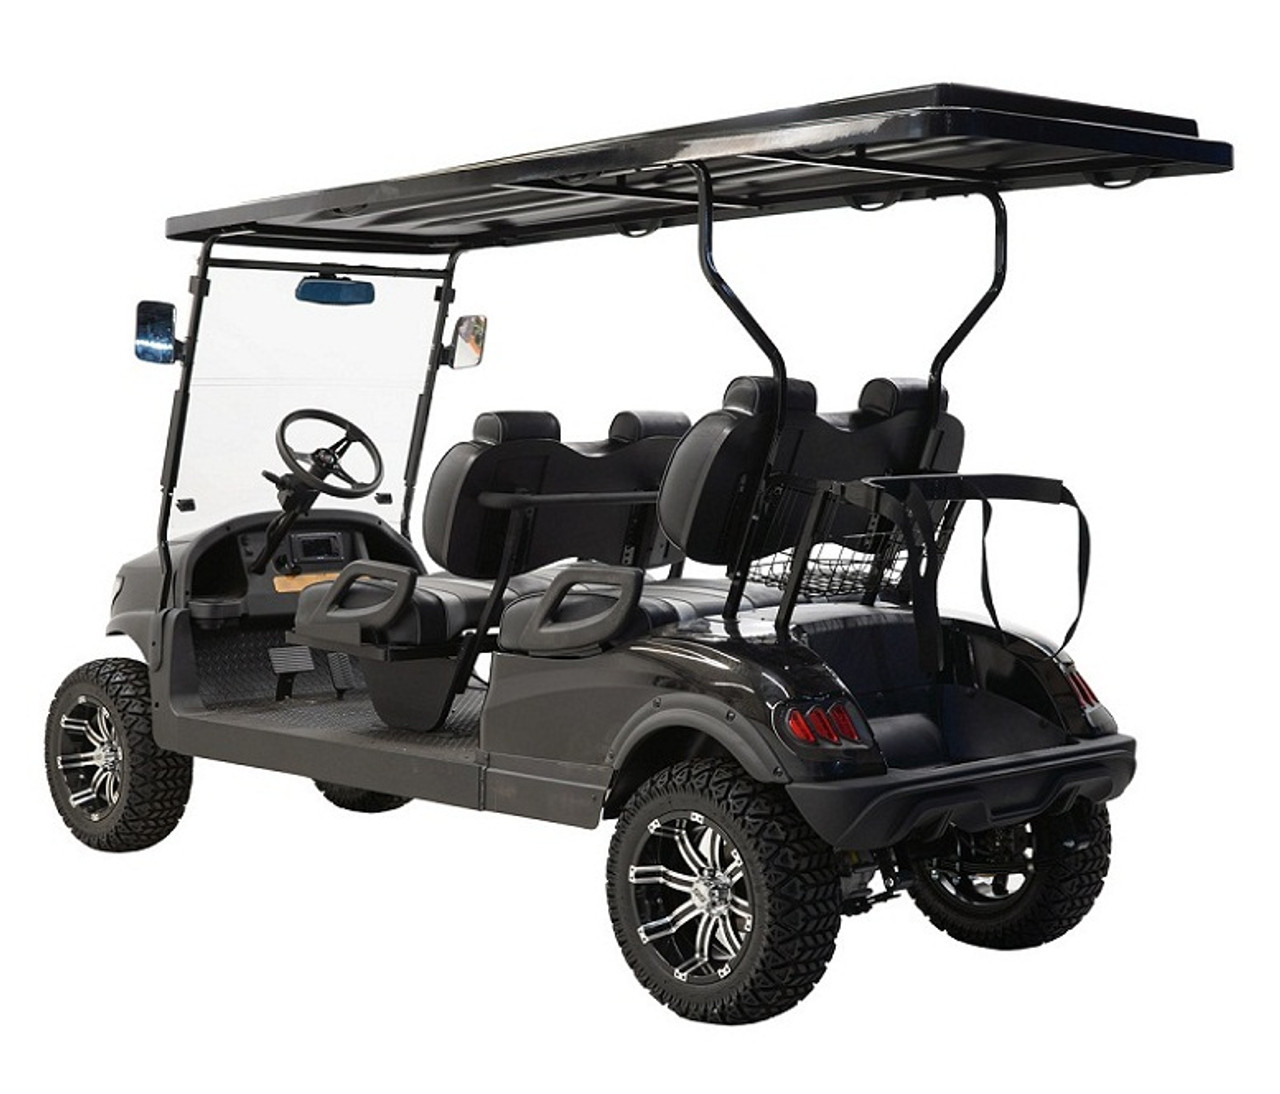 MASSIMO MGC4 48V GOLF CART UTV, 48V AC MOTOR